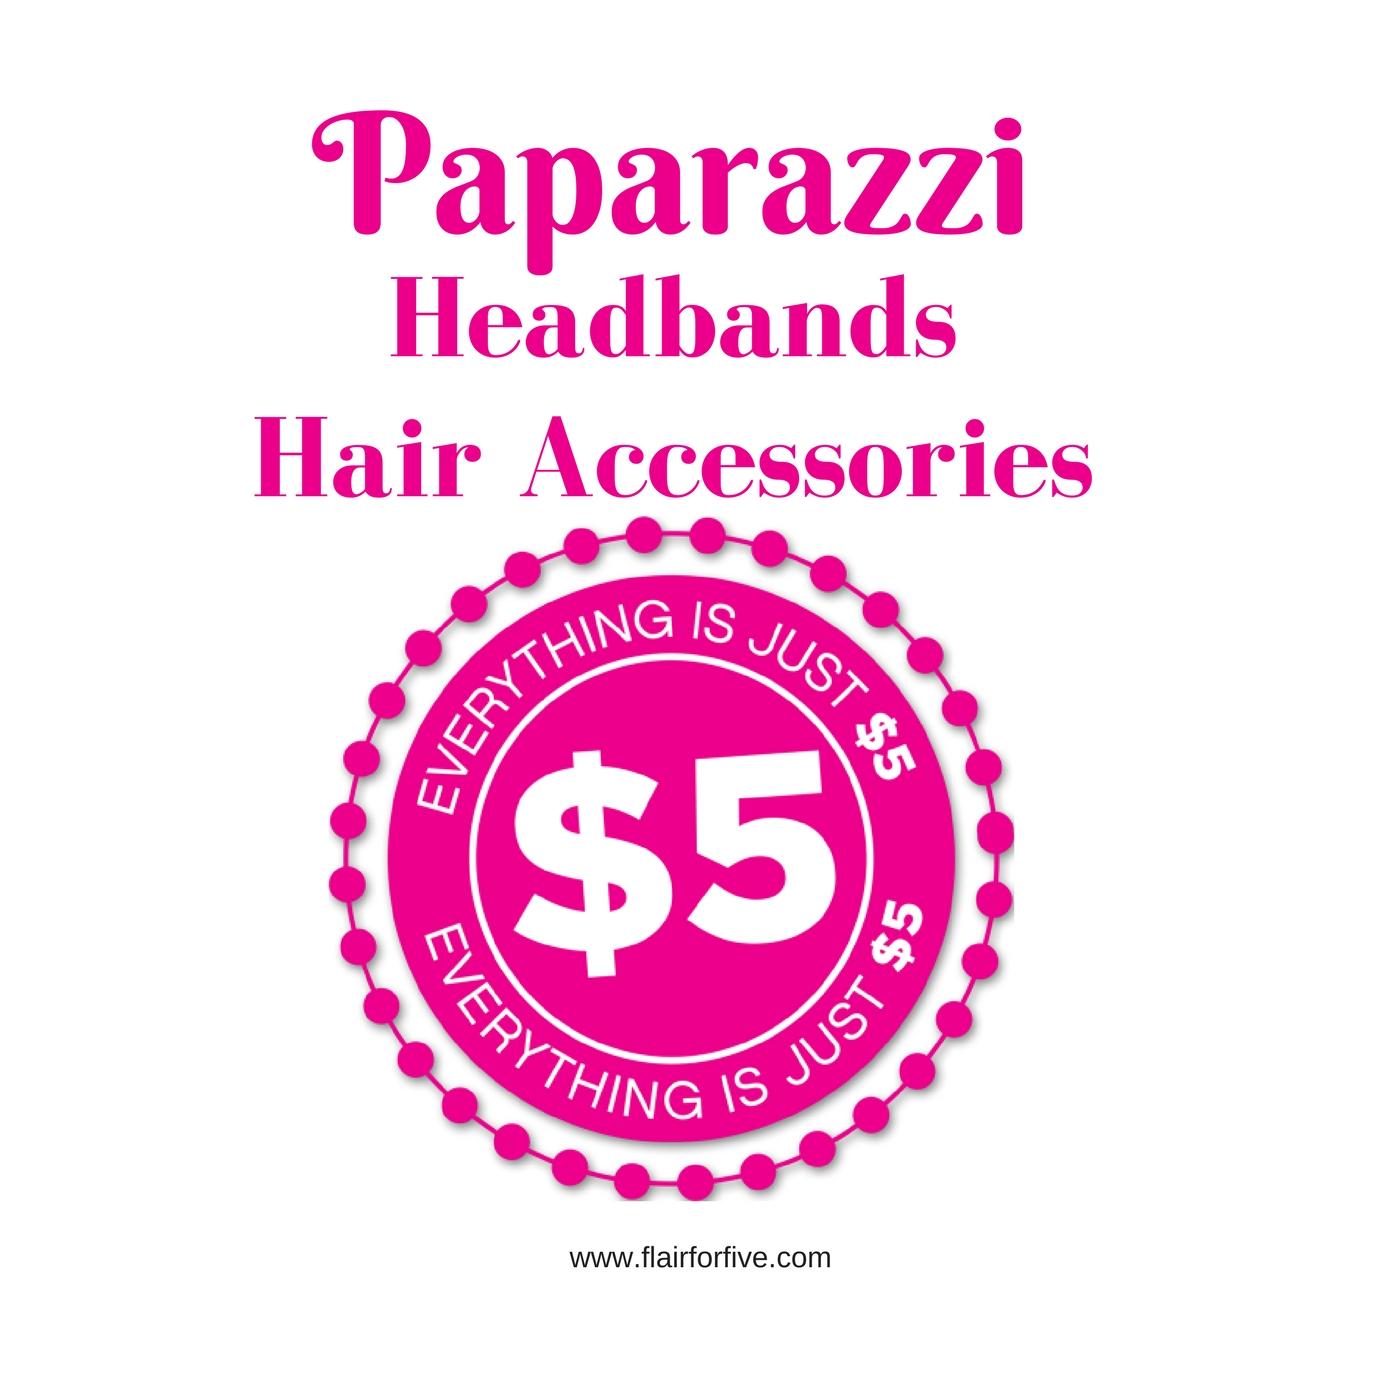 Paparazzi Headbands/Hair Accessories